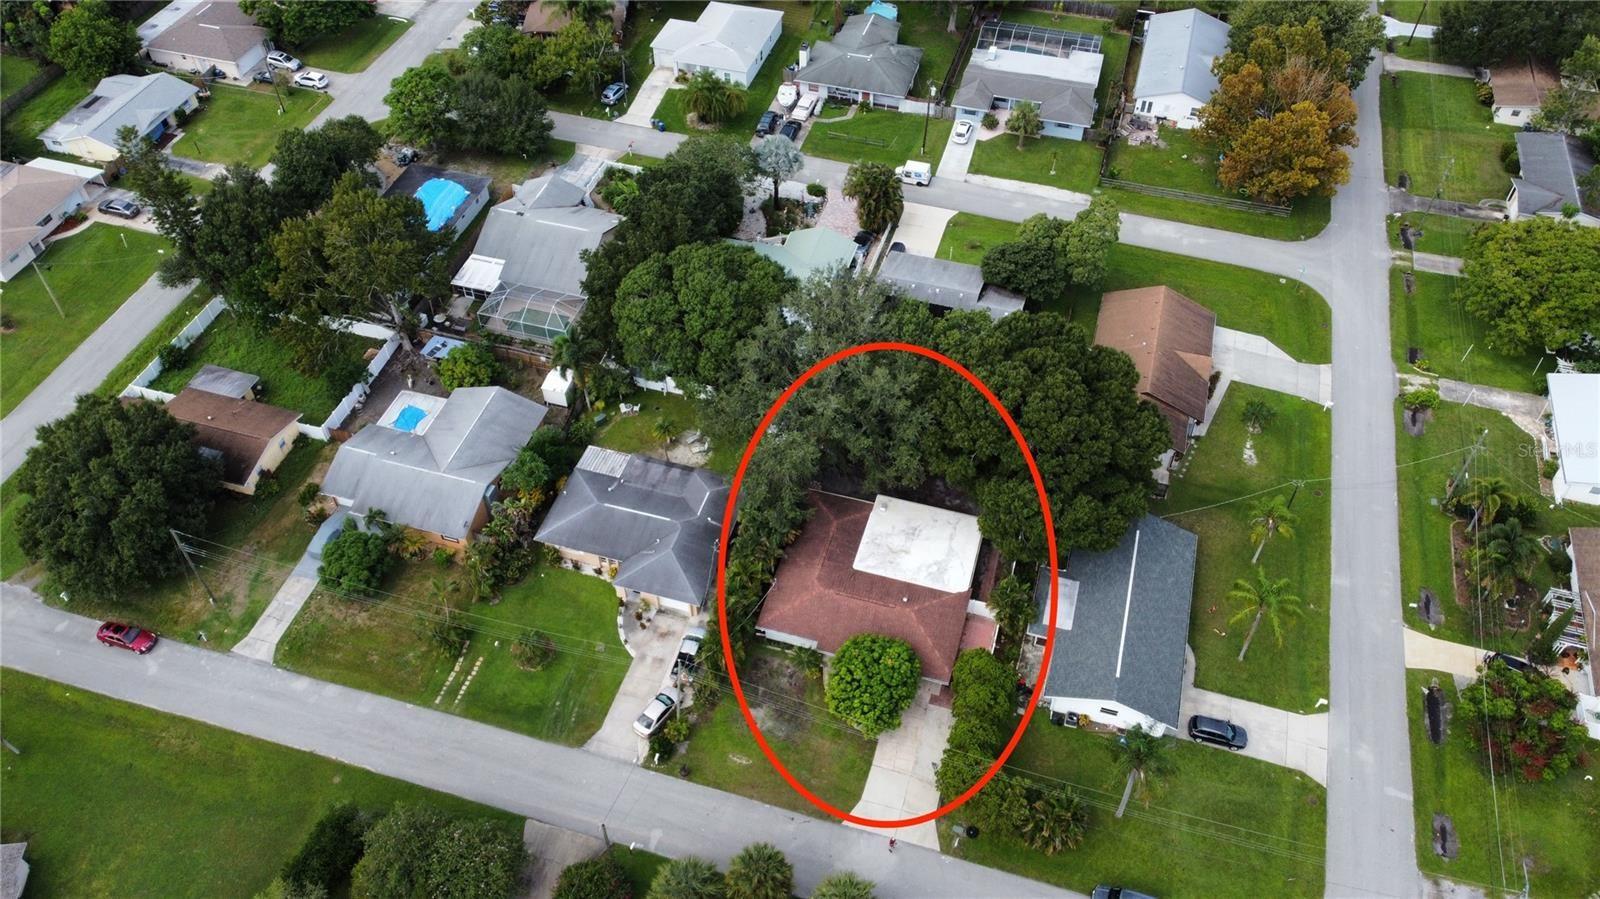 Photo of 3214 HART WAY, SARASOTA, FL 34232 (MLS # A4511402)